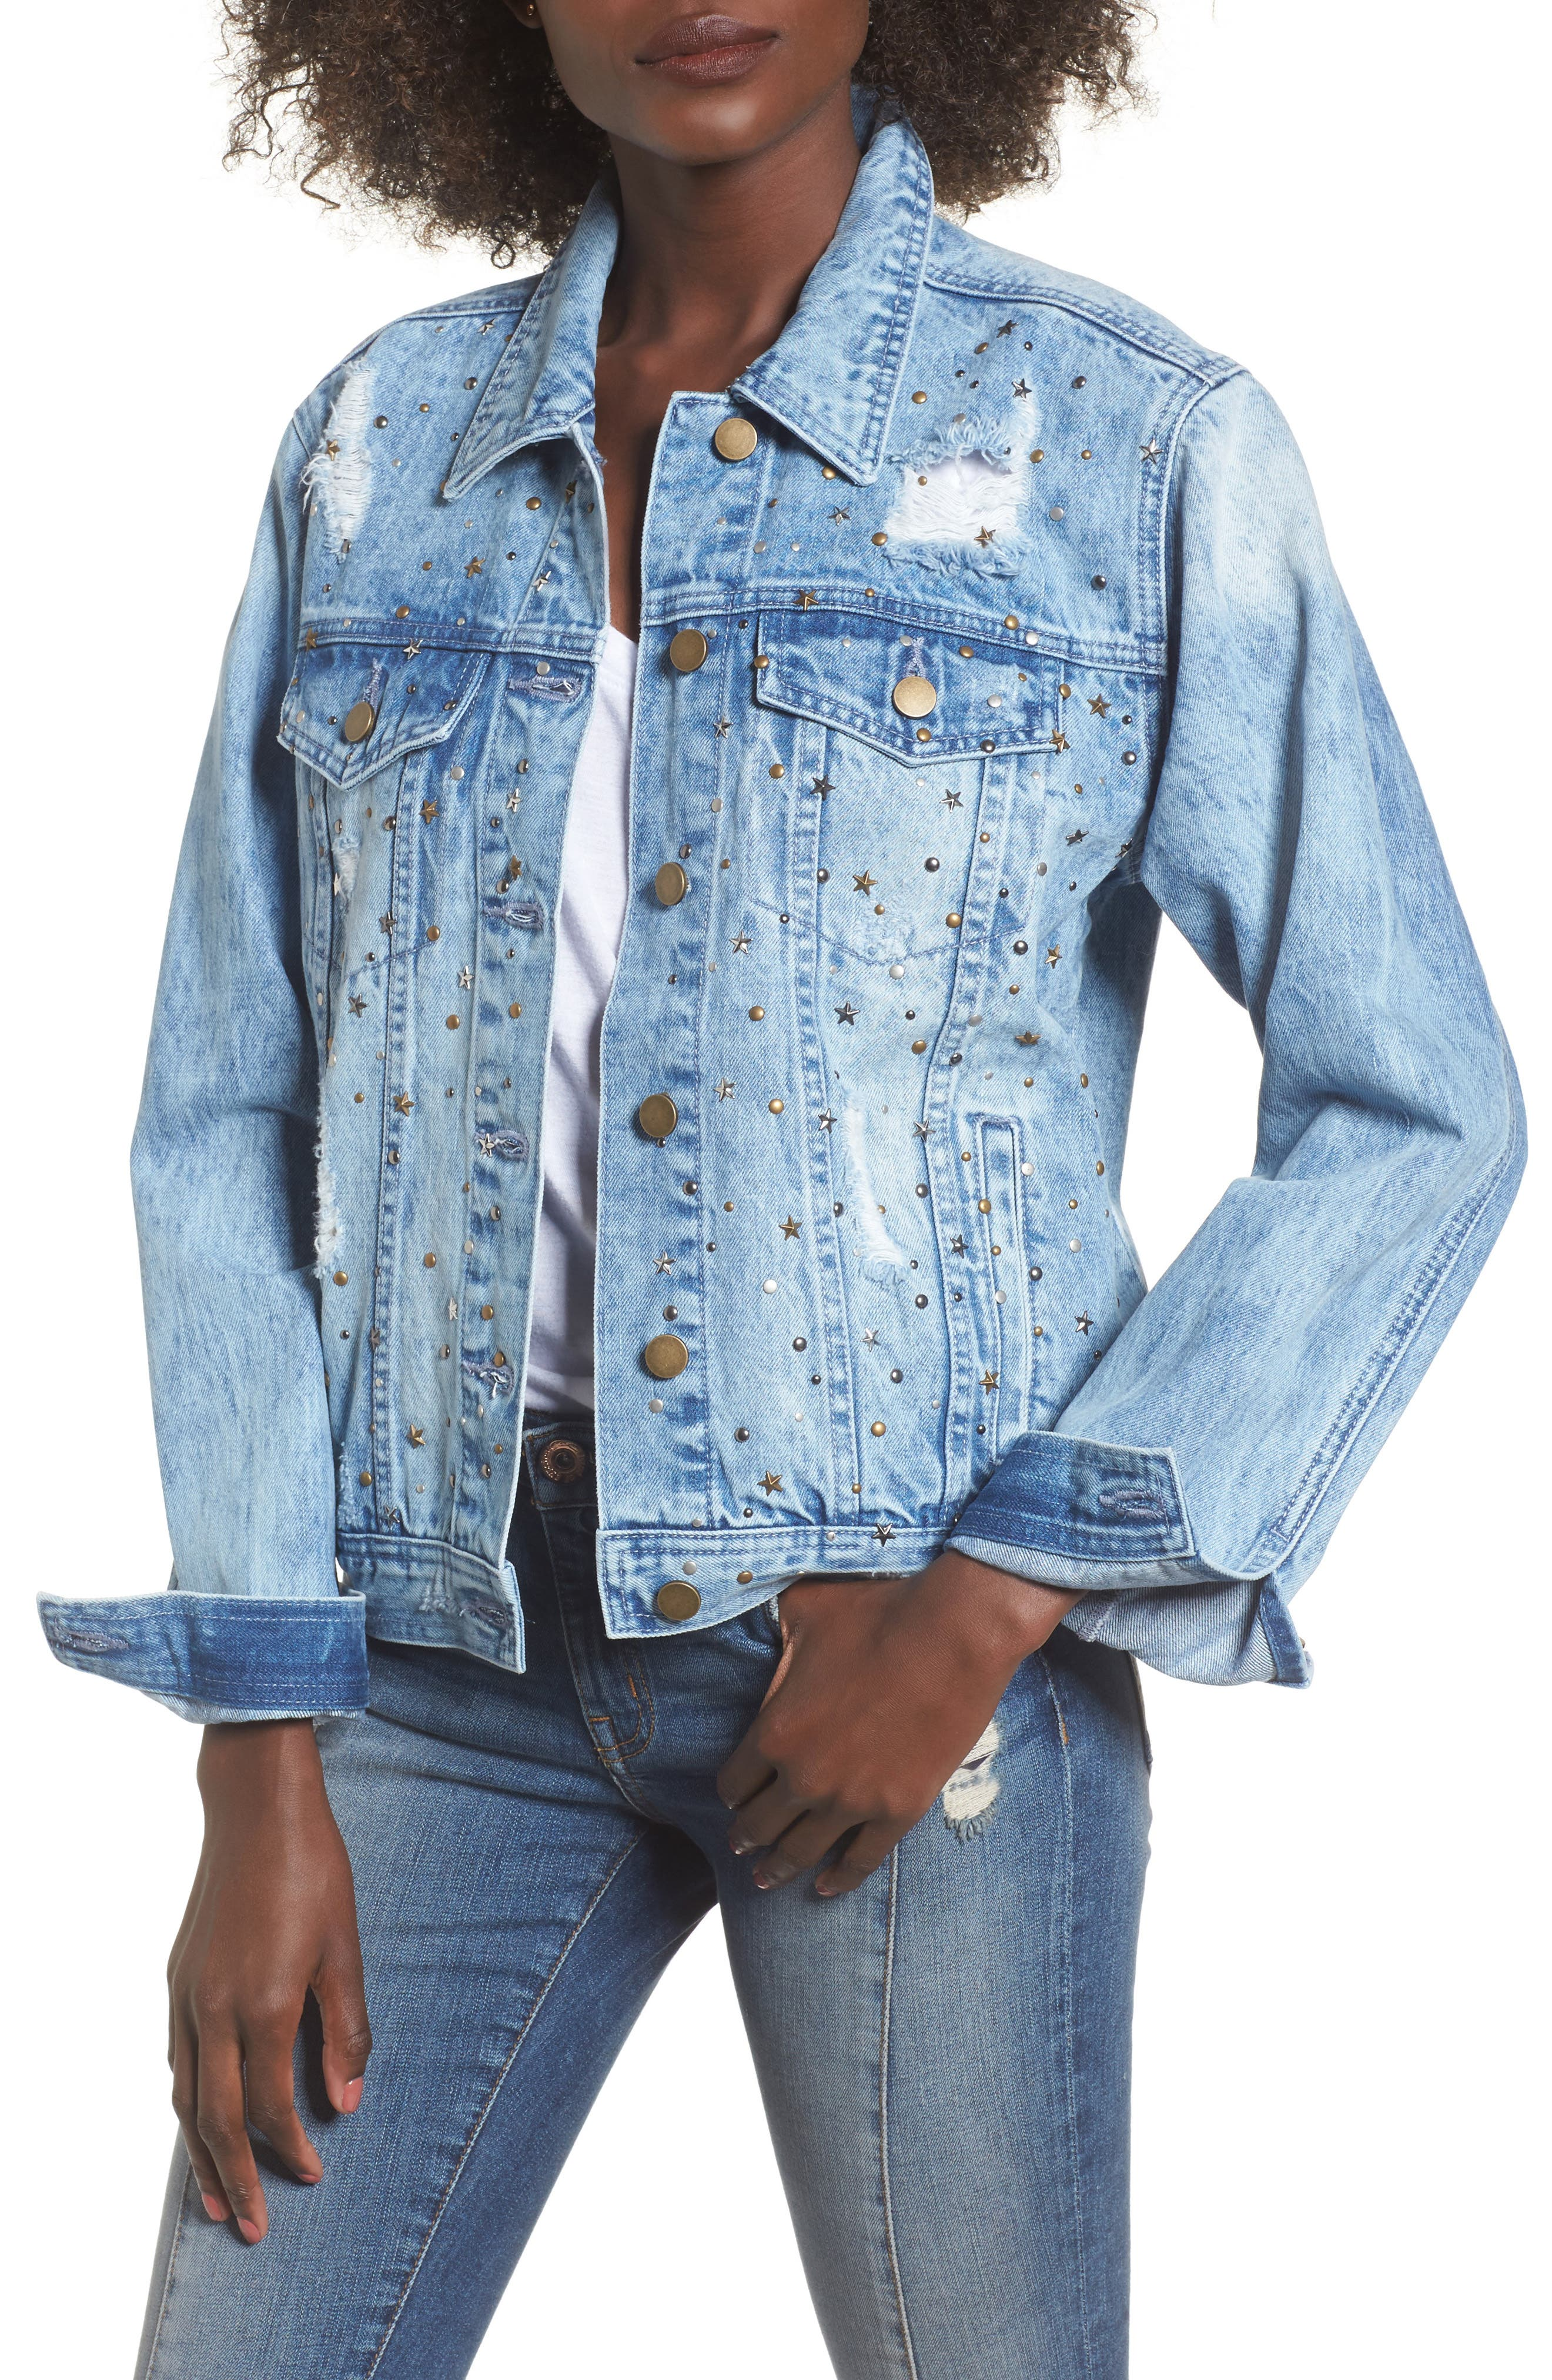 Alternate Image 1 Selected - Tinsel Star & Stud Denim Jacket